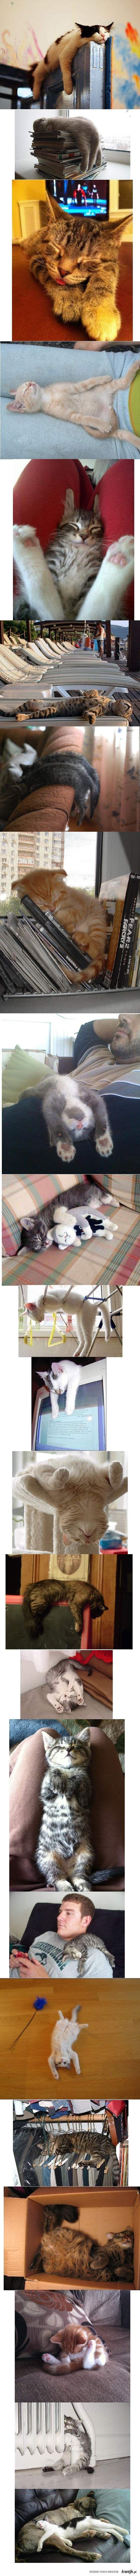 A cat can sleep anywhere. (scheduled via http://www.tailwindapp.com?utm_source=pinterest&utm_medium=twpin&utm_content=post16018292&utm_campaign=scheduler_attribution)